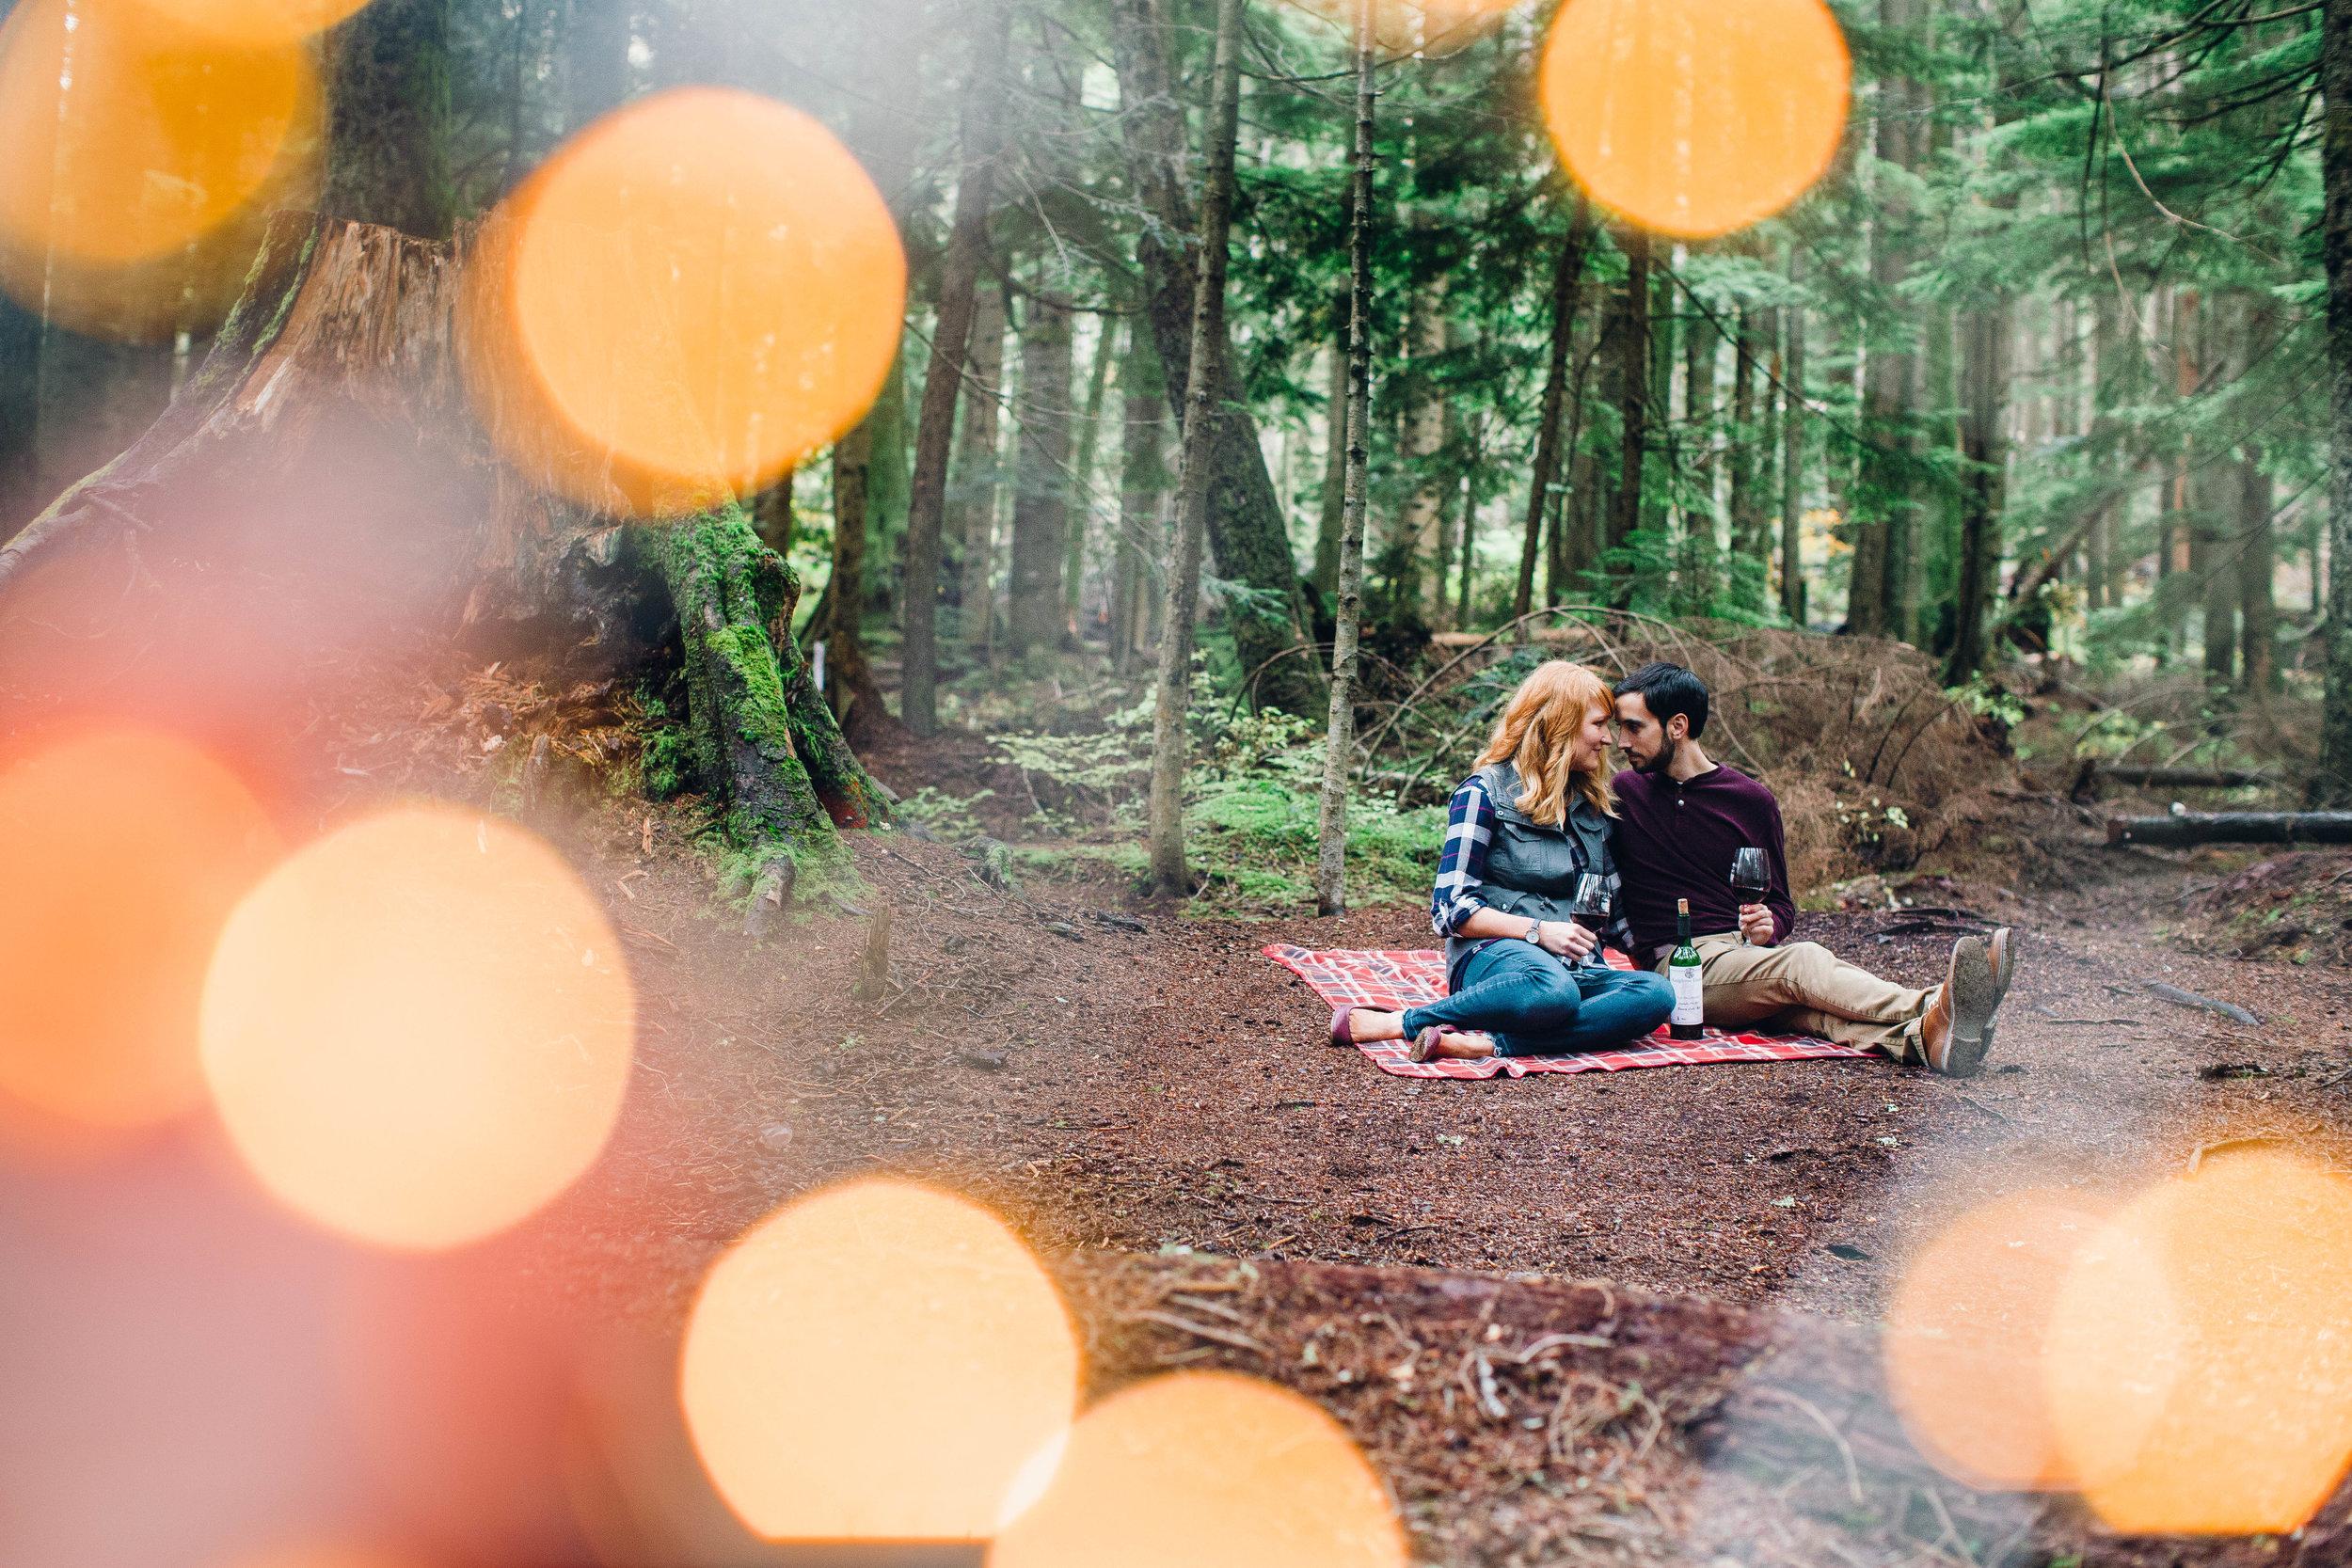 Ryan+Nicole_Franklin+Falls+Engagement_APW2016_35.JPG